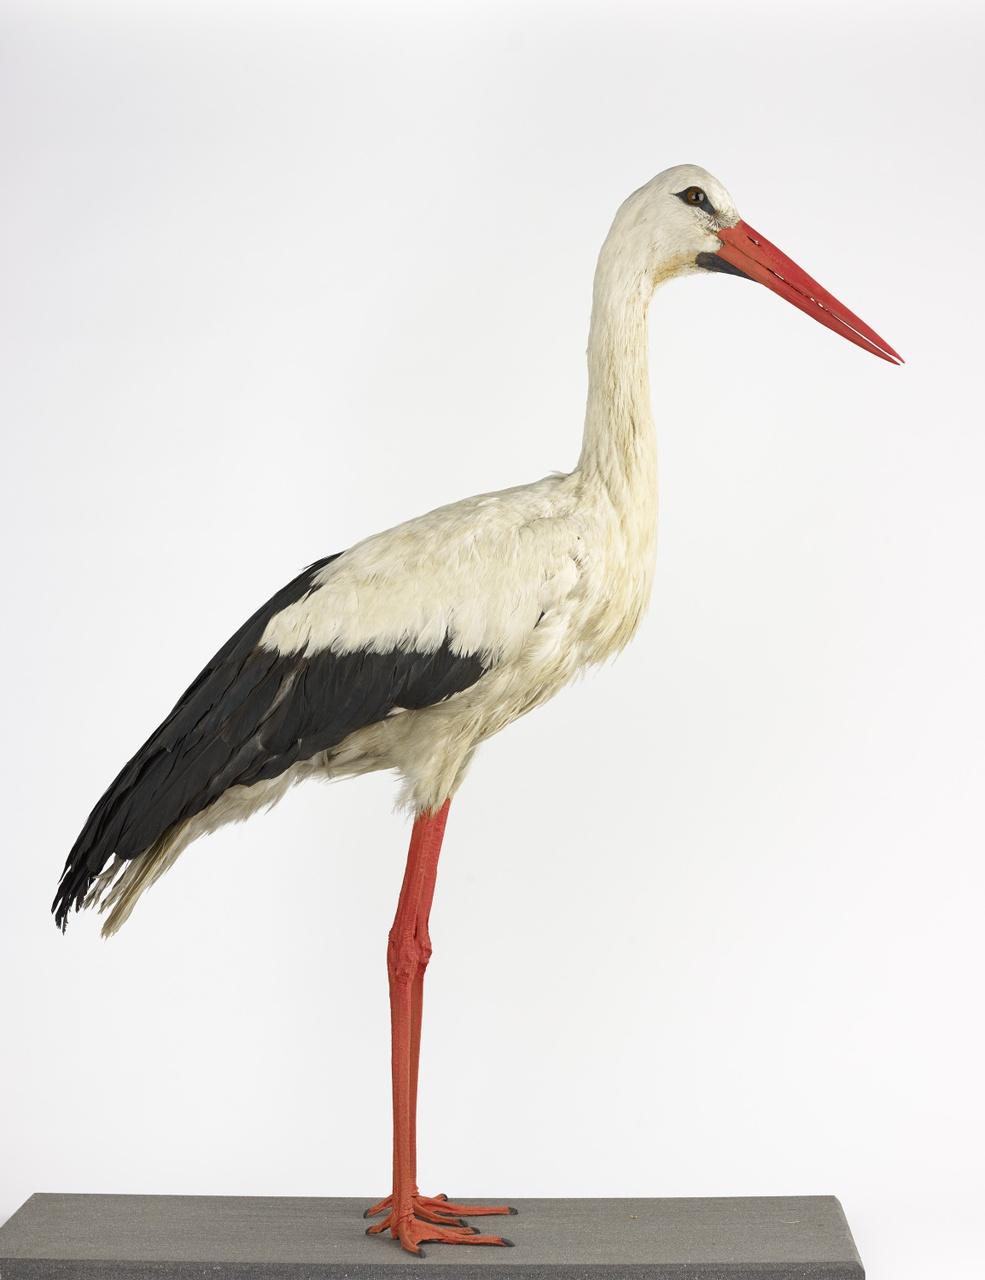 Ciconia ciconia (Linnaeus, 1758), Ooievaar, opgezette vogel